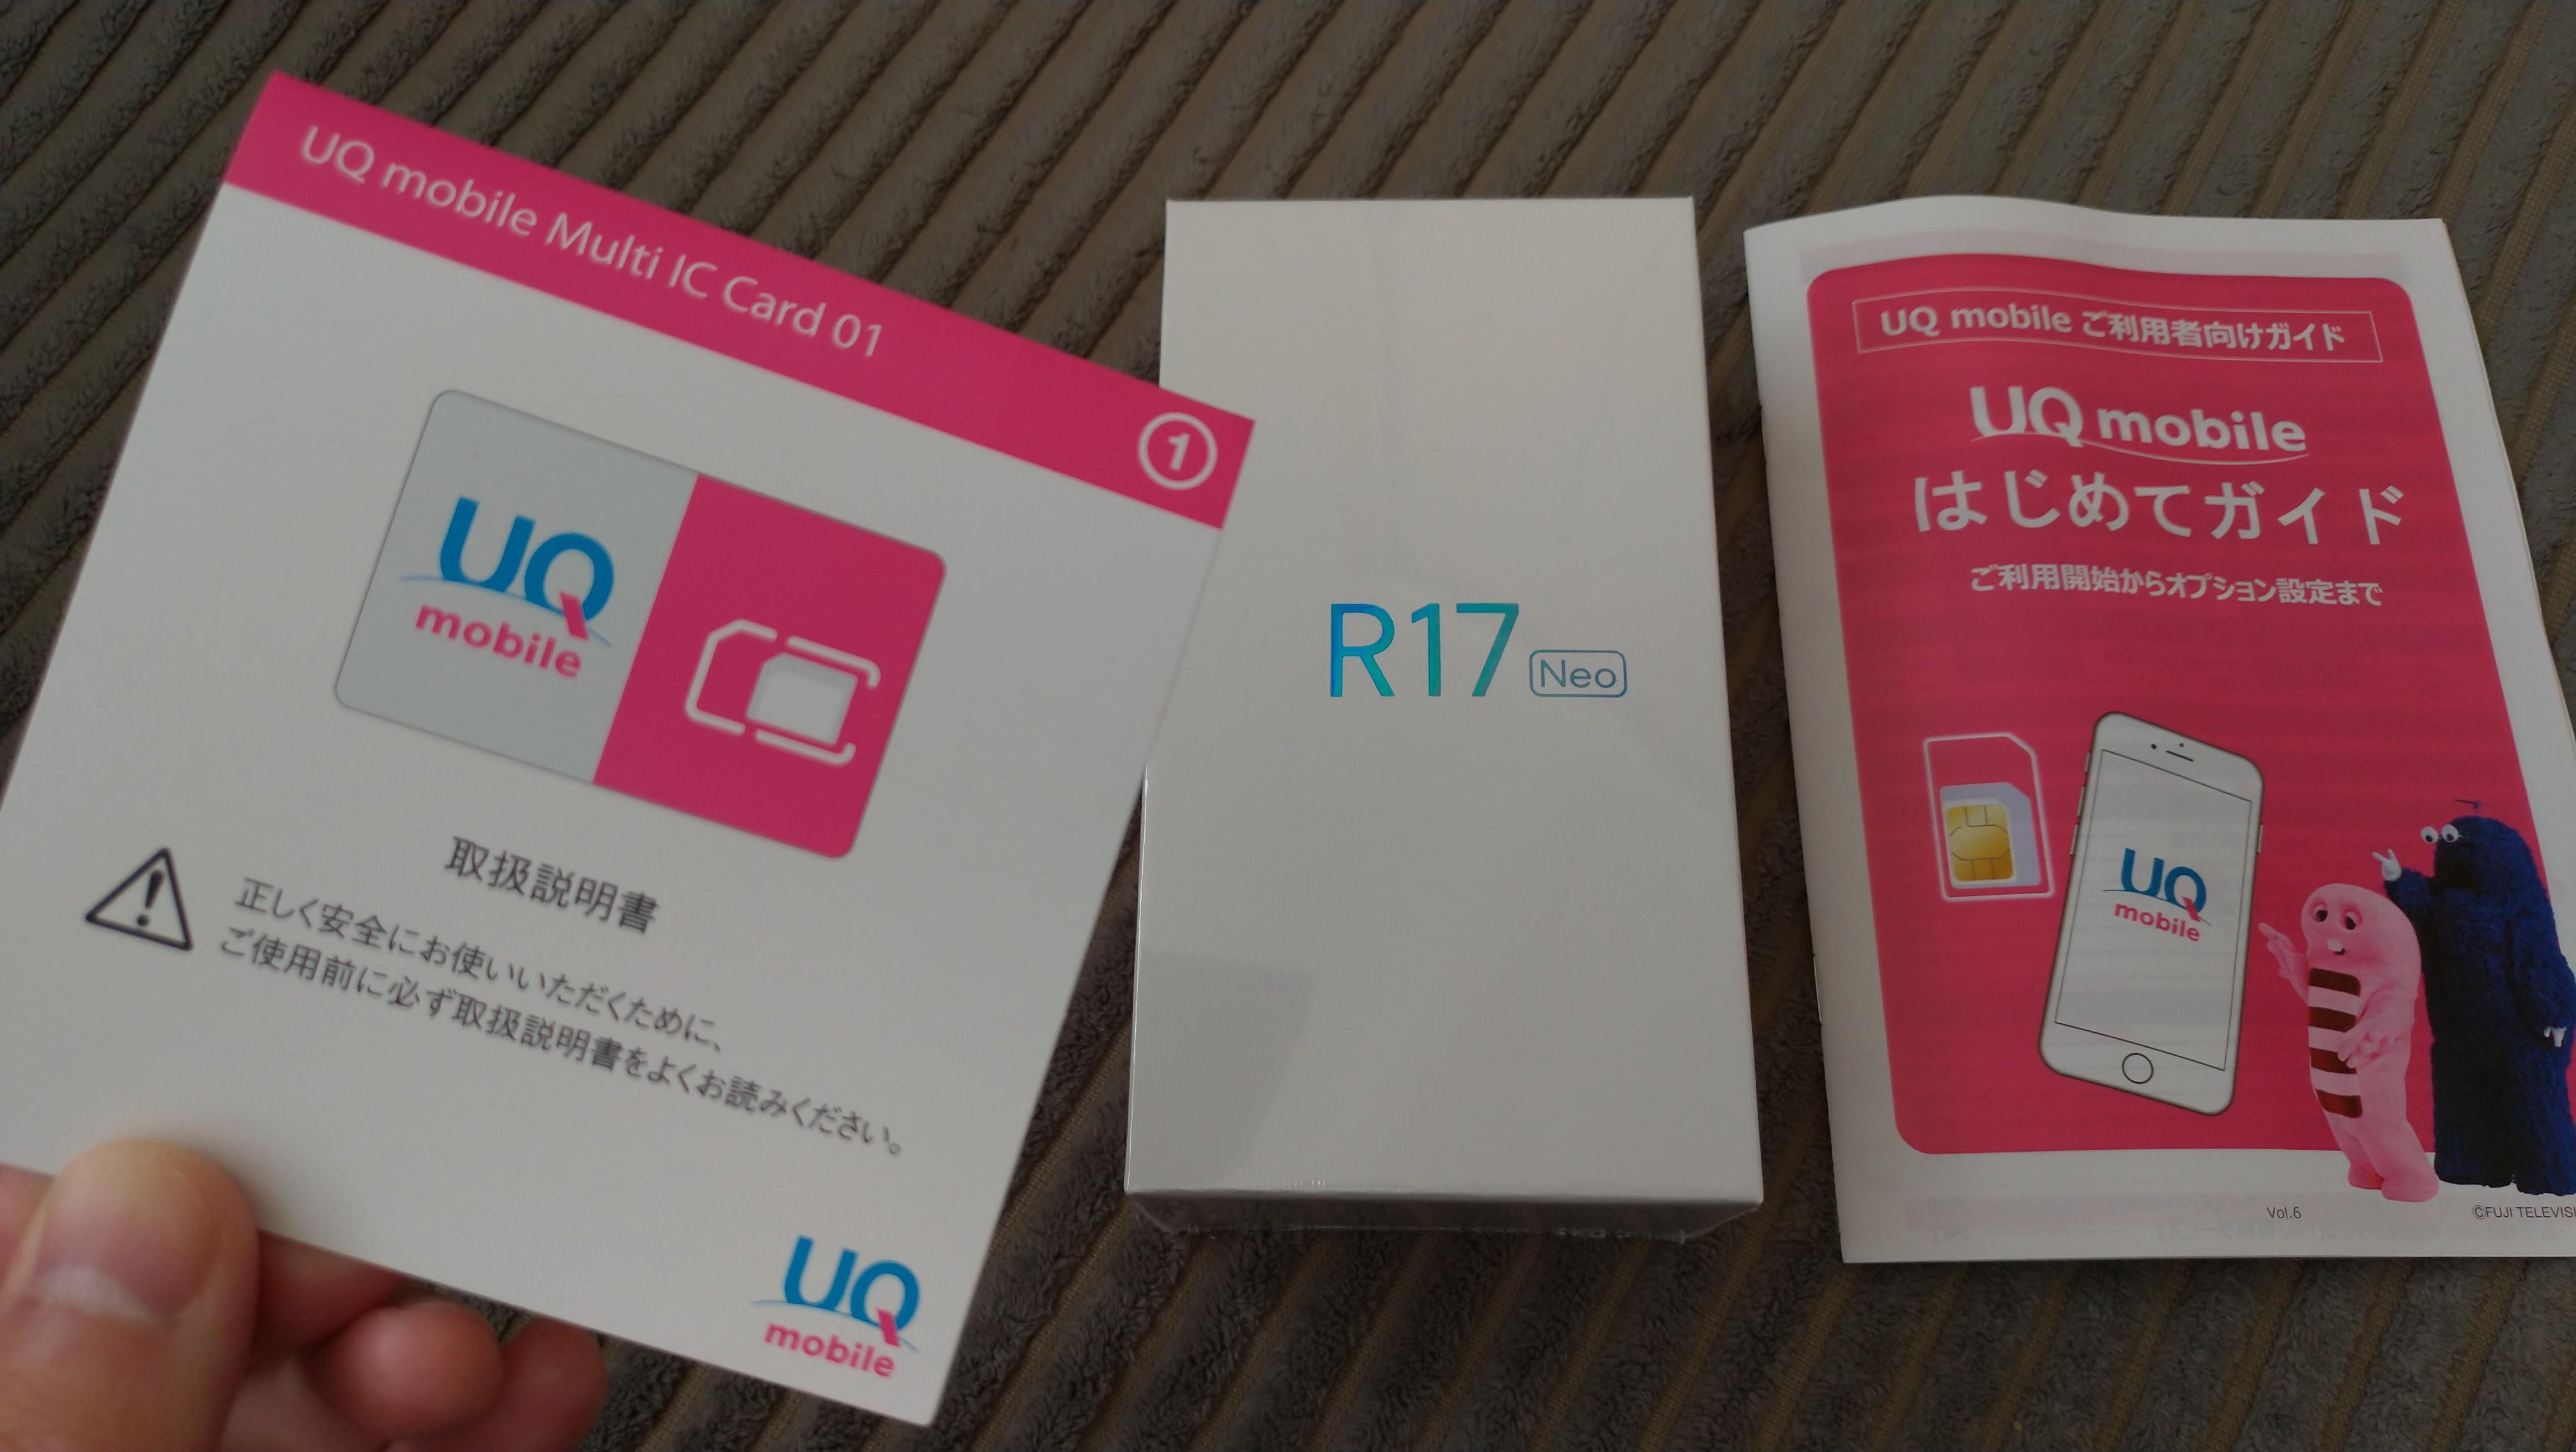 UQ mobileのSIMカード